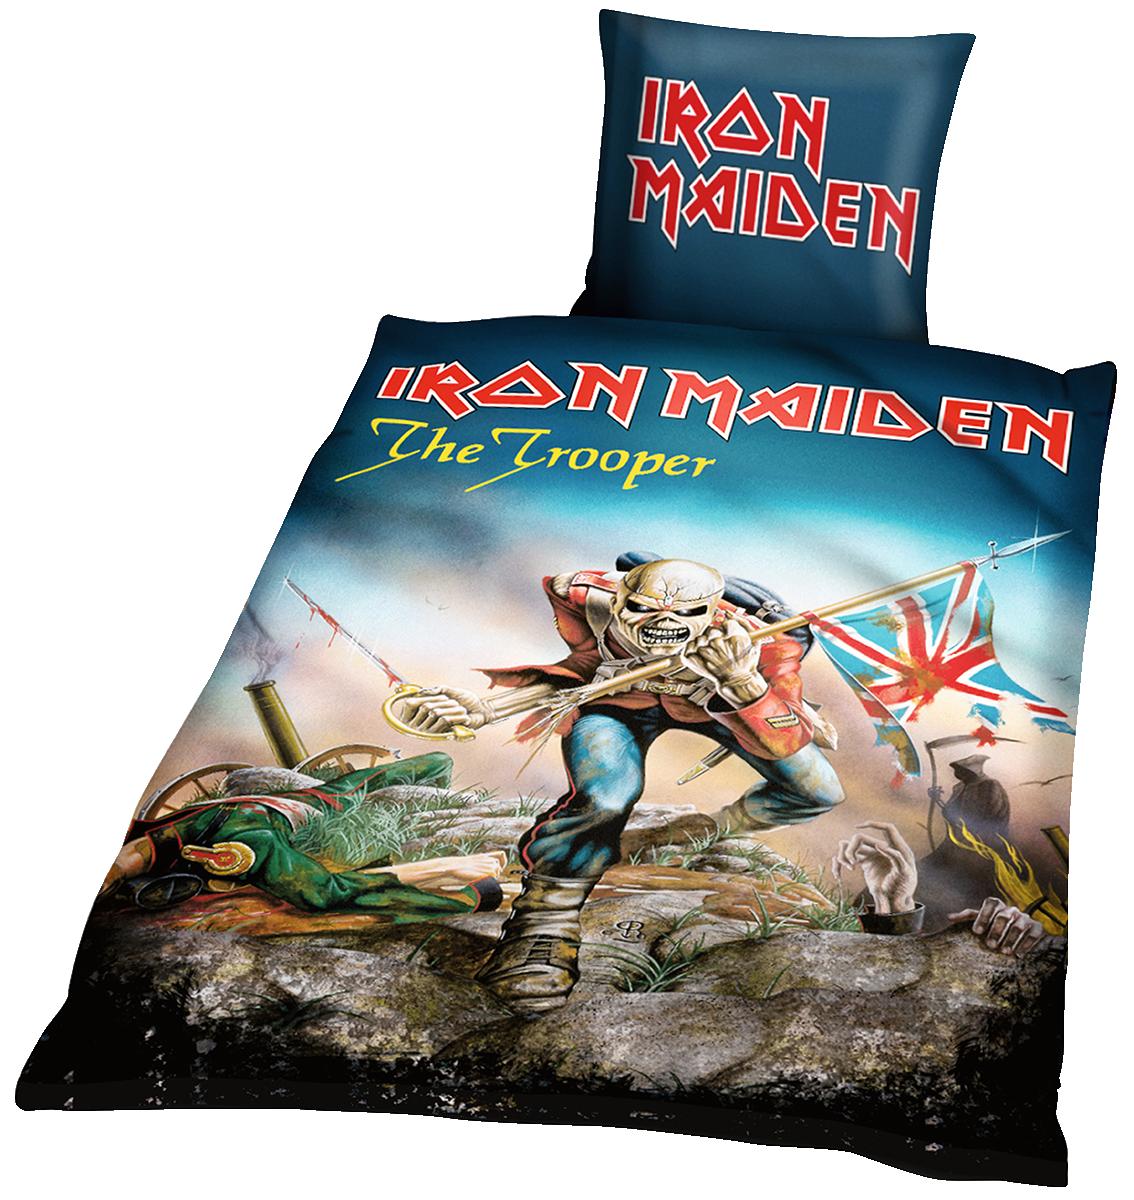 Iron Maiden - The trooper - Bettwäsche - multicolor